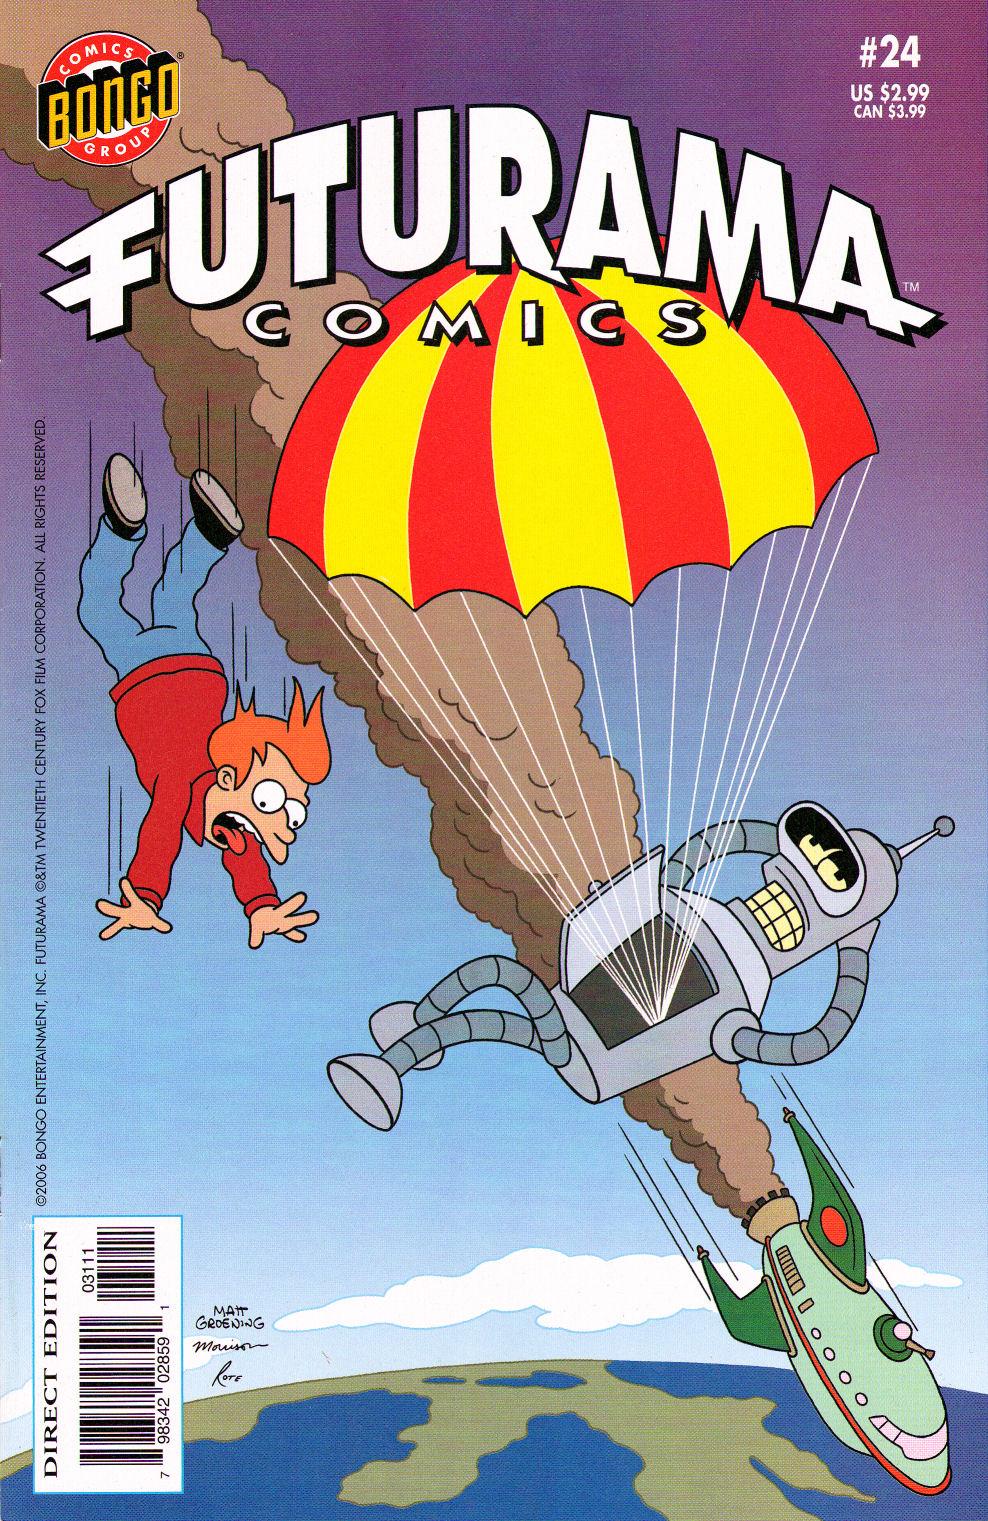 Futurama Comics issue 24 - Page 1